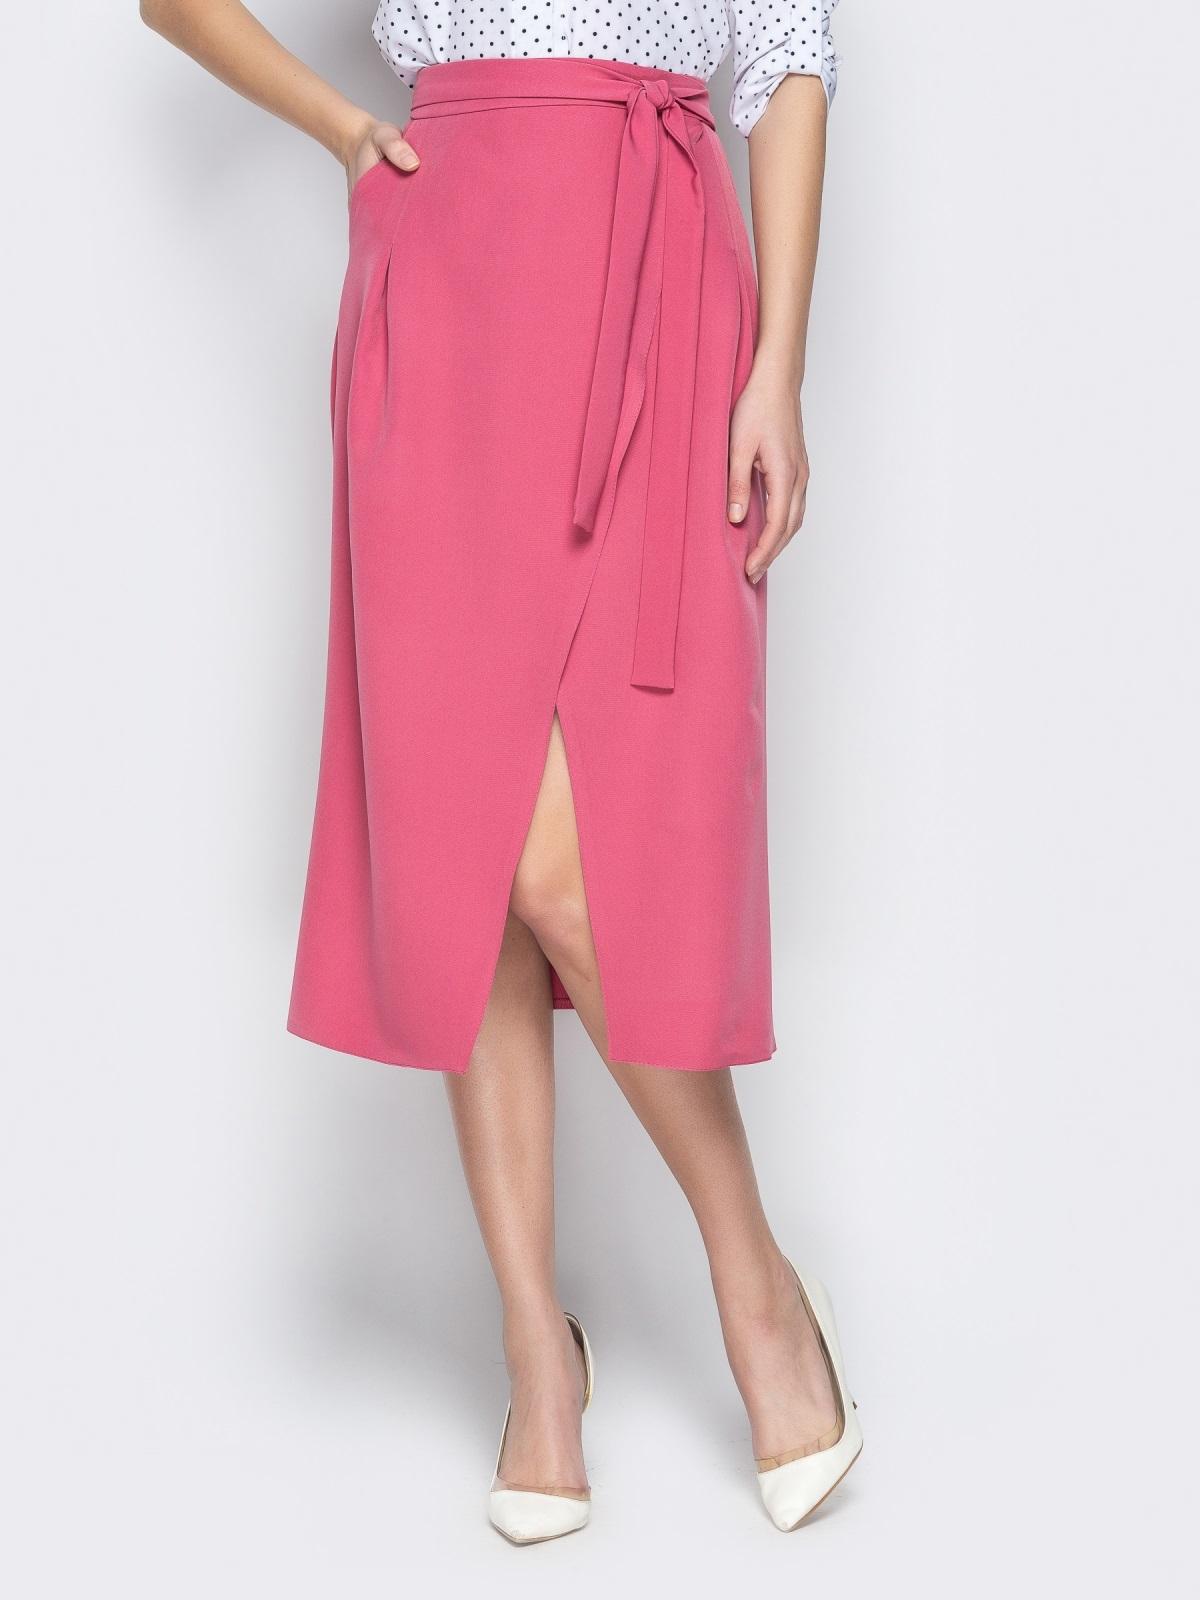 Розовая юбка-миди с запахом - 20947, фото 1 – интернет-магазин Dressa